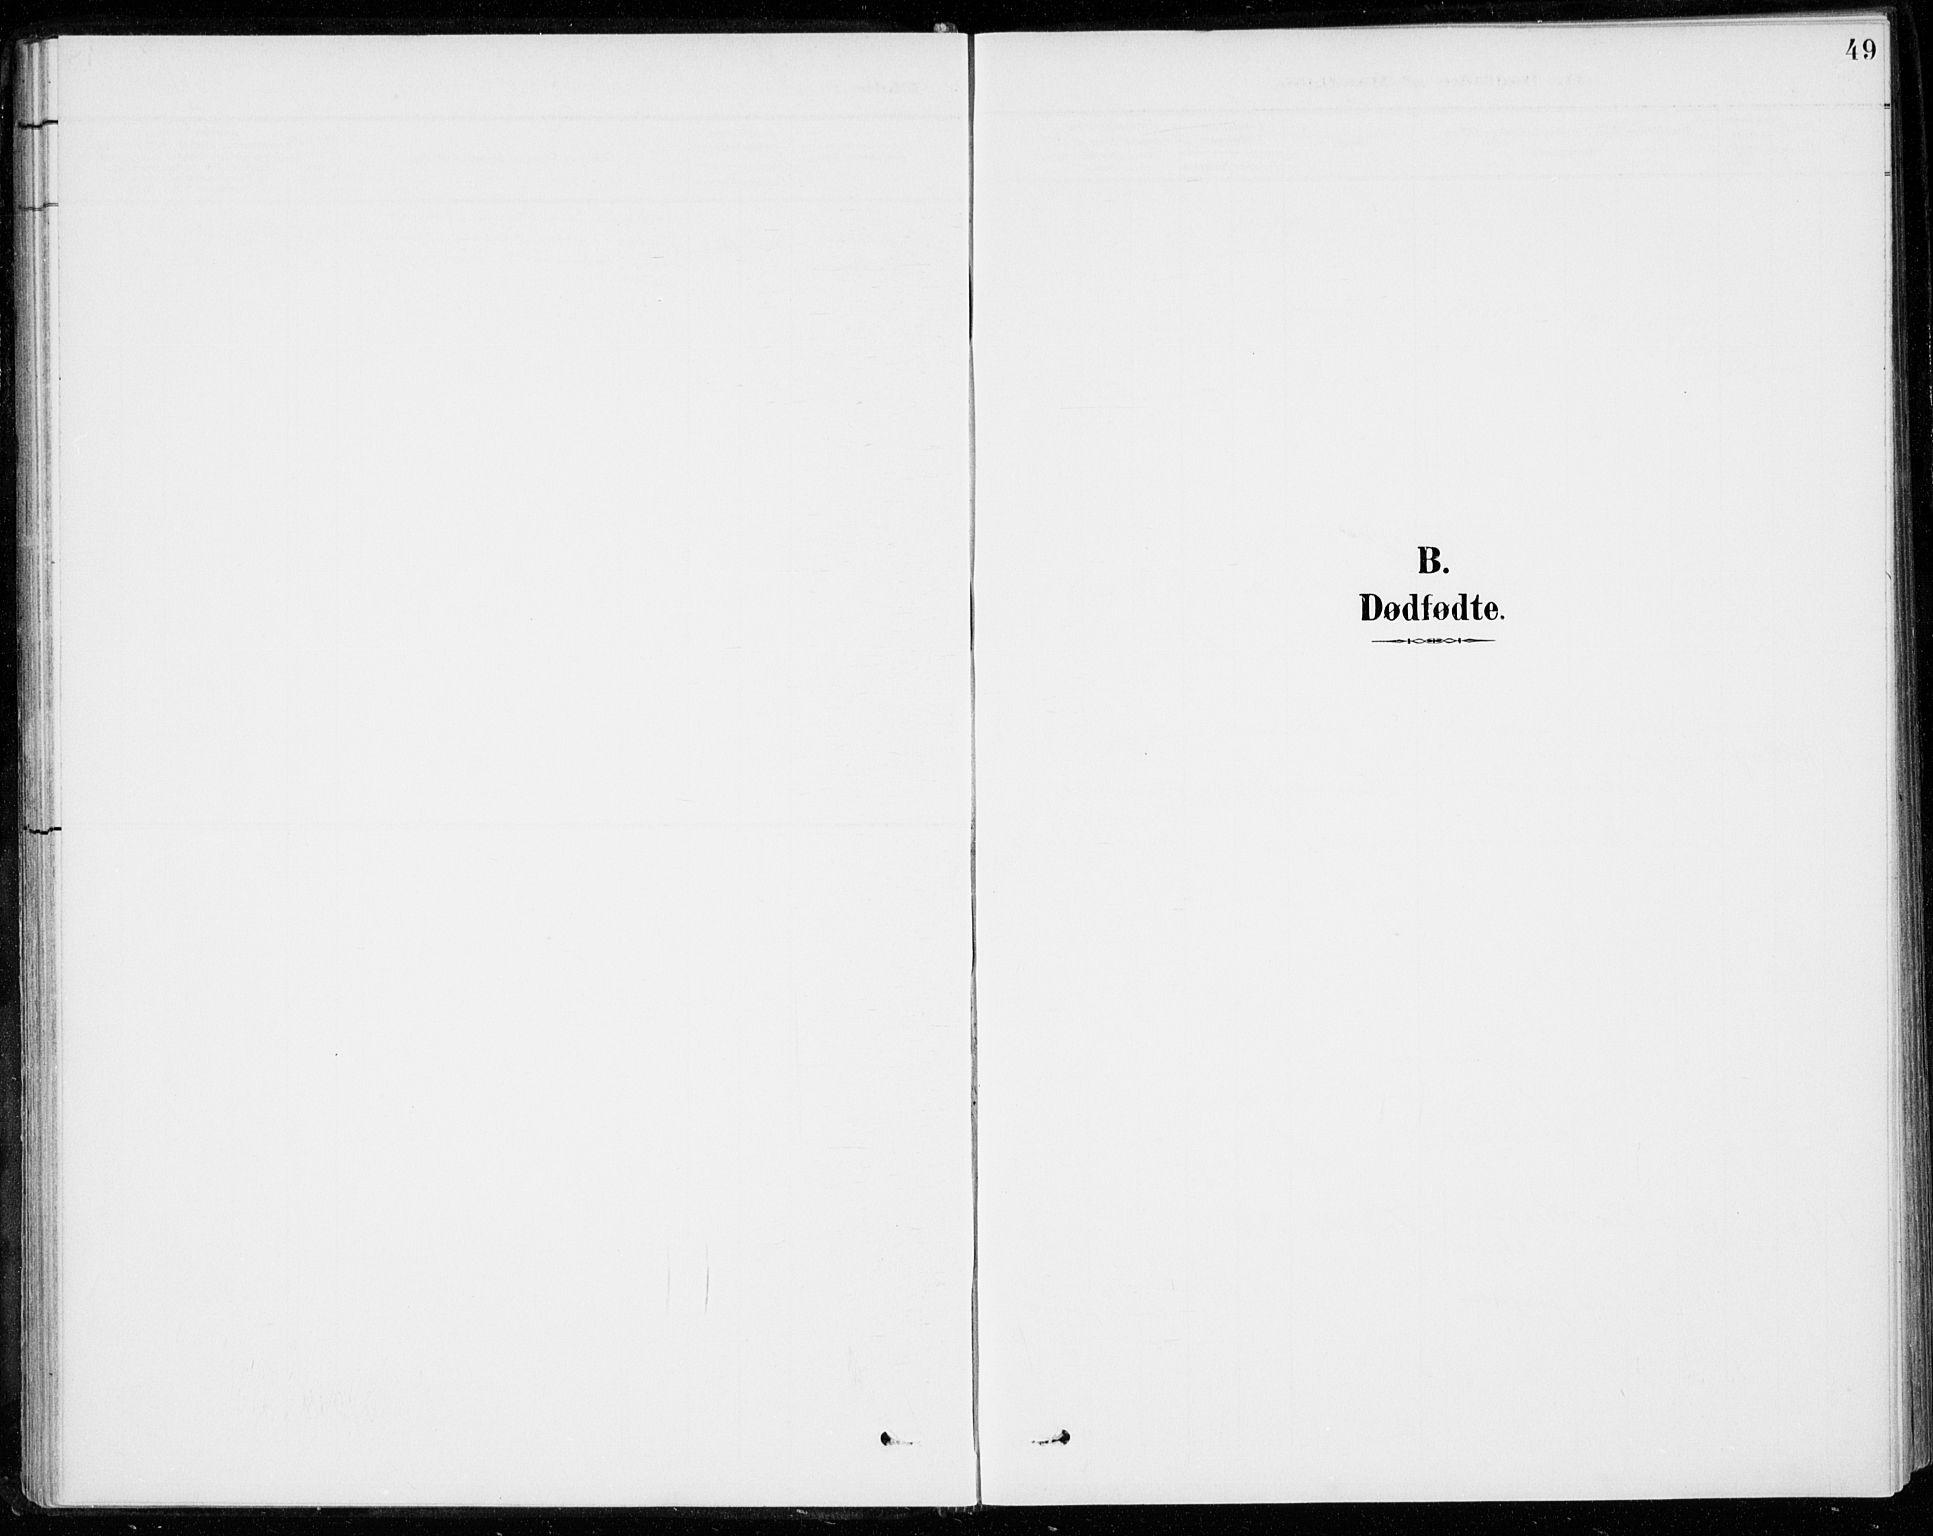 SAKO, Sigdal kirkebøker, F/Fc/L0002: Ministerialbok nr. III 2, 1894-1911, s. 49